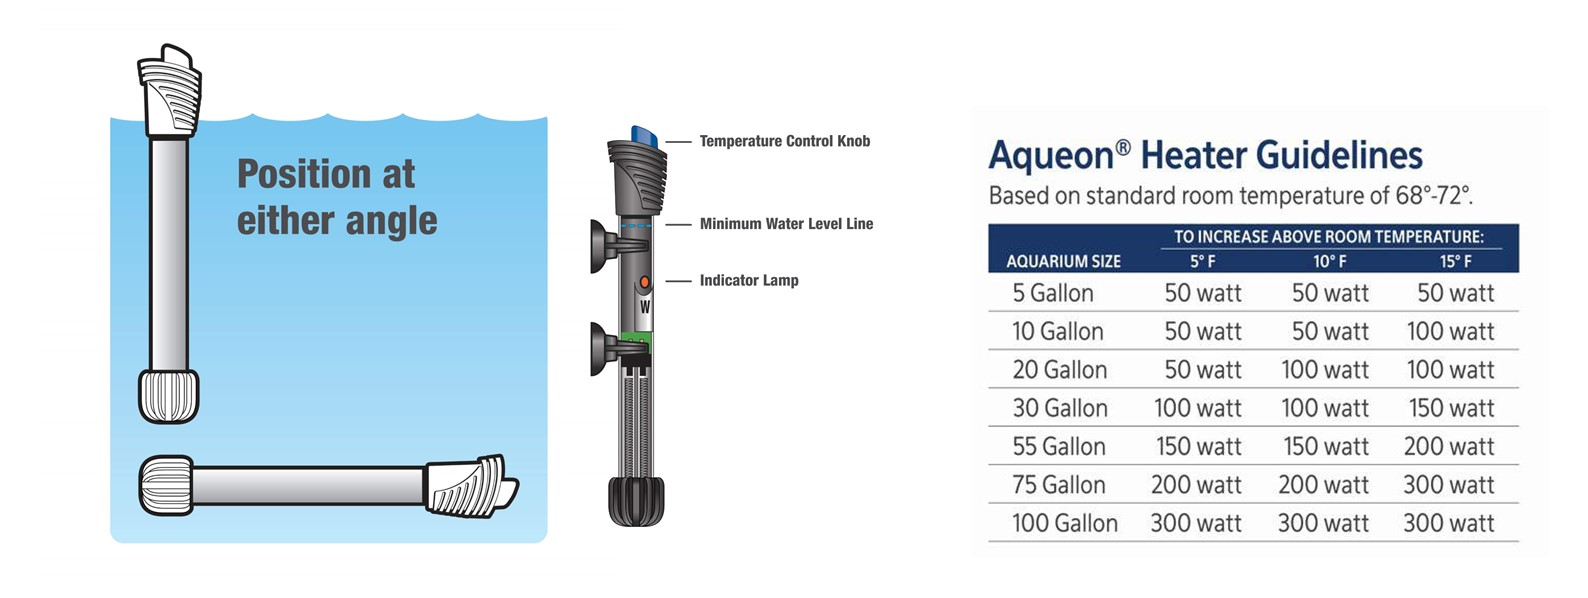 aqueon-submersible-fish-aquarium-heater-50w-pf002023-details.jpg